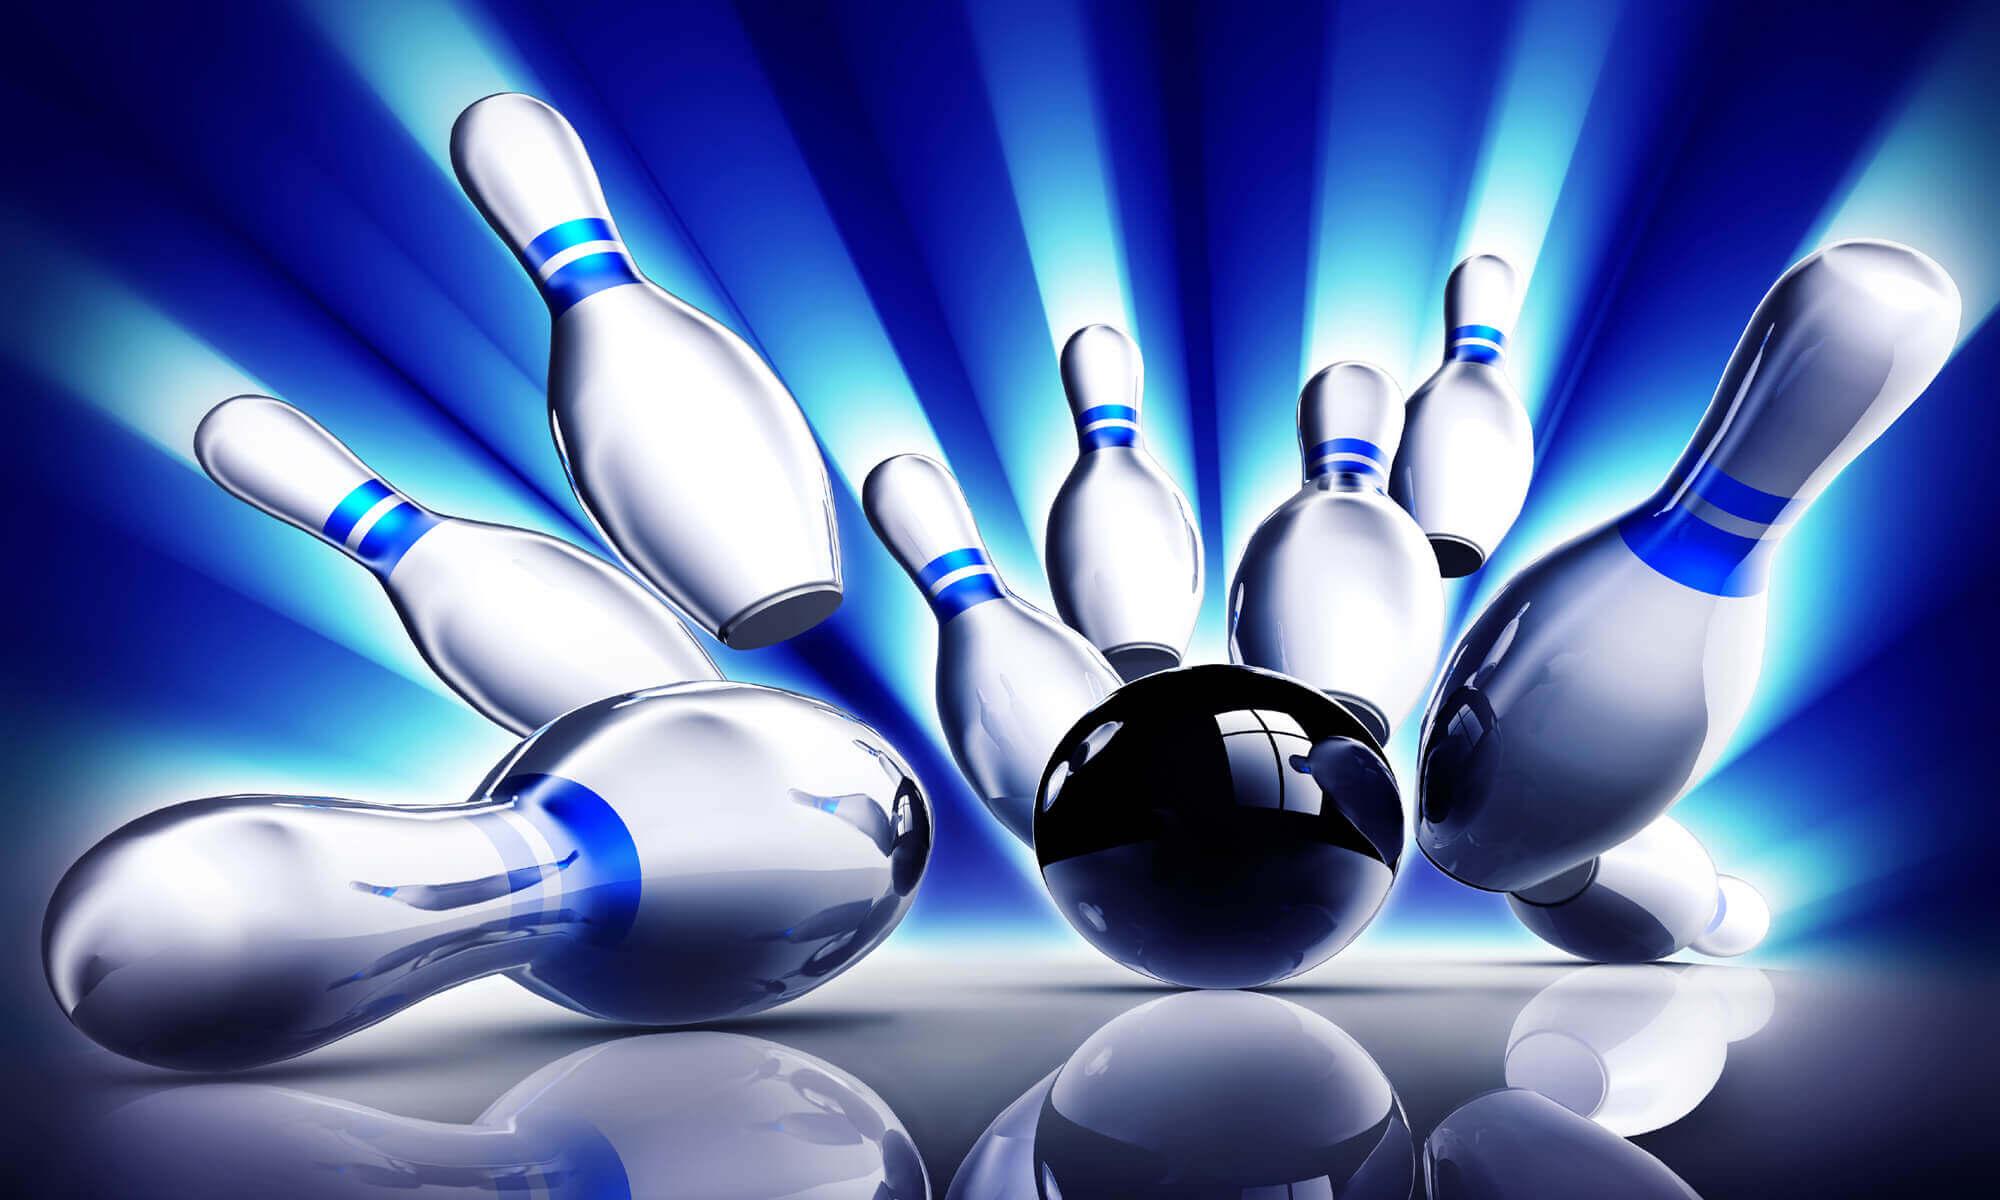 Bowling Wallpaper   2000x1200   Download HD Wallpaper   WallpaperTip 2000x1200